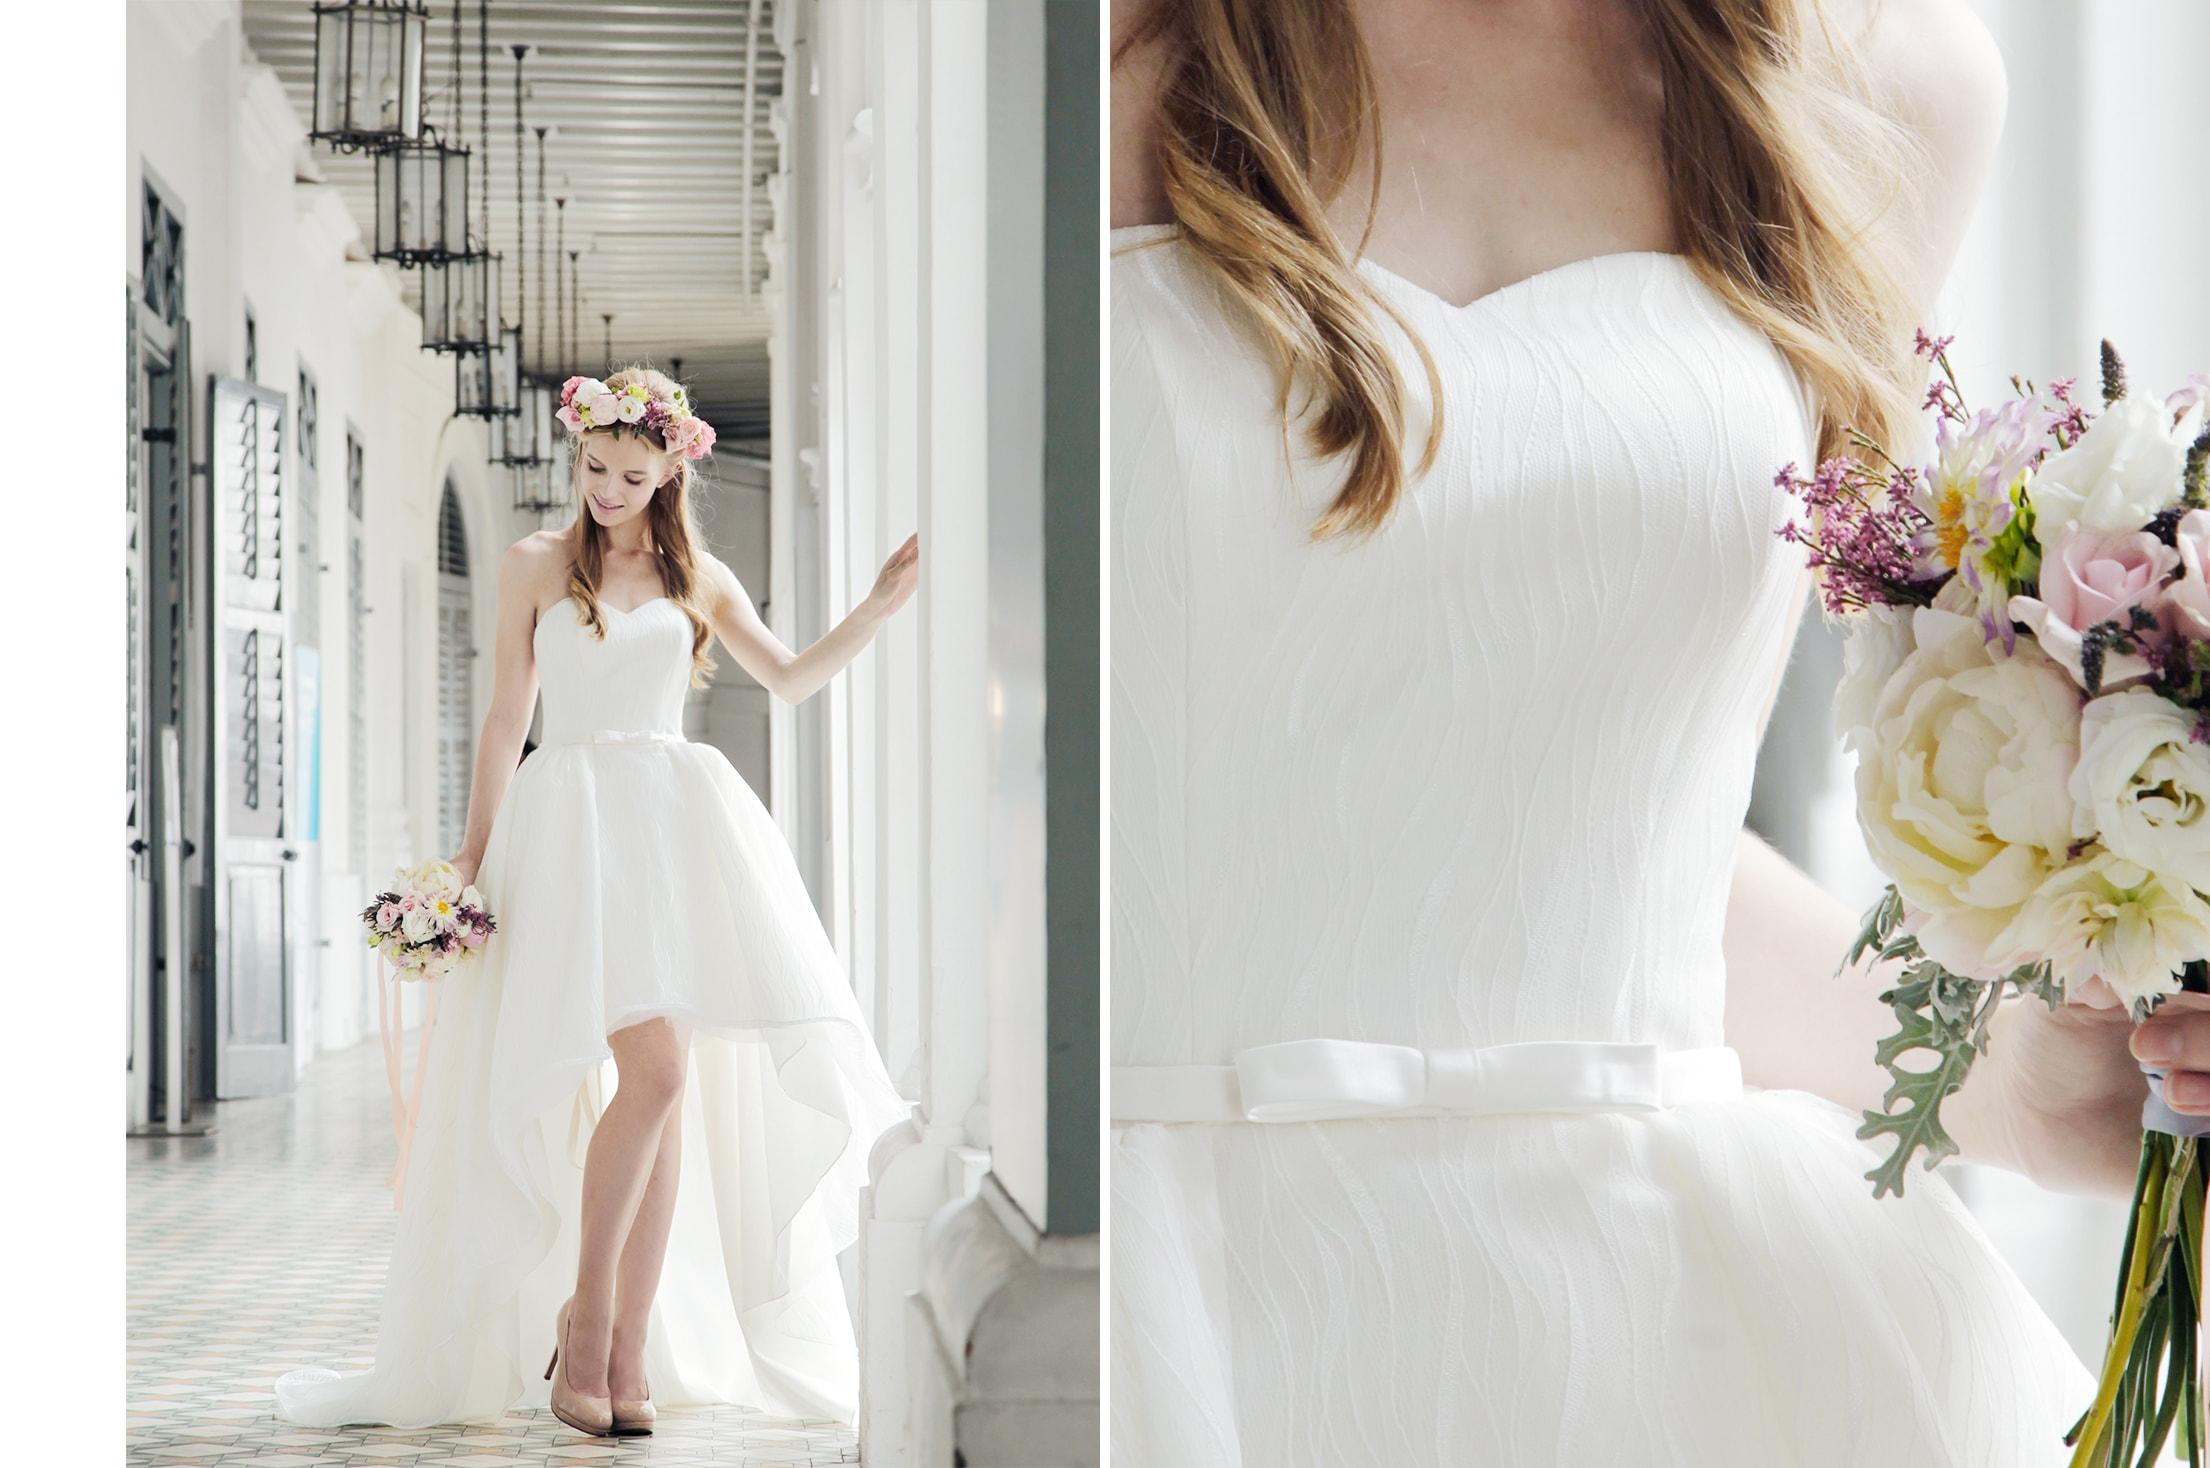 09-Z-Wedding-Tube-Asymmetrical-Engagement-Dress